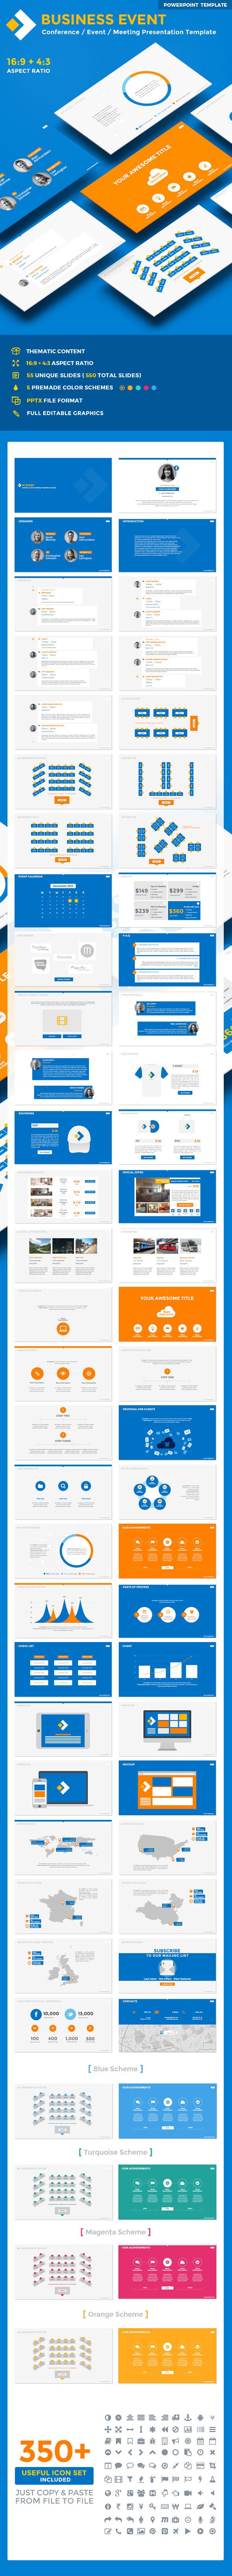 Business Event PowerPoint Presentation Template - Business PowerPoint Templates